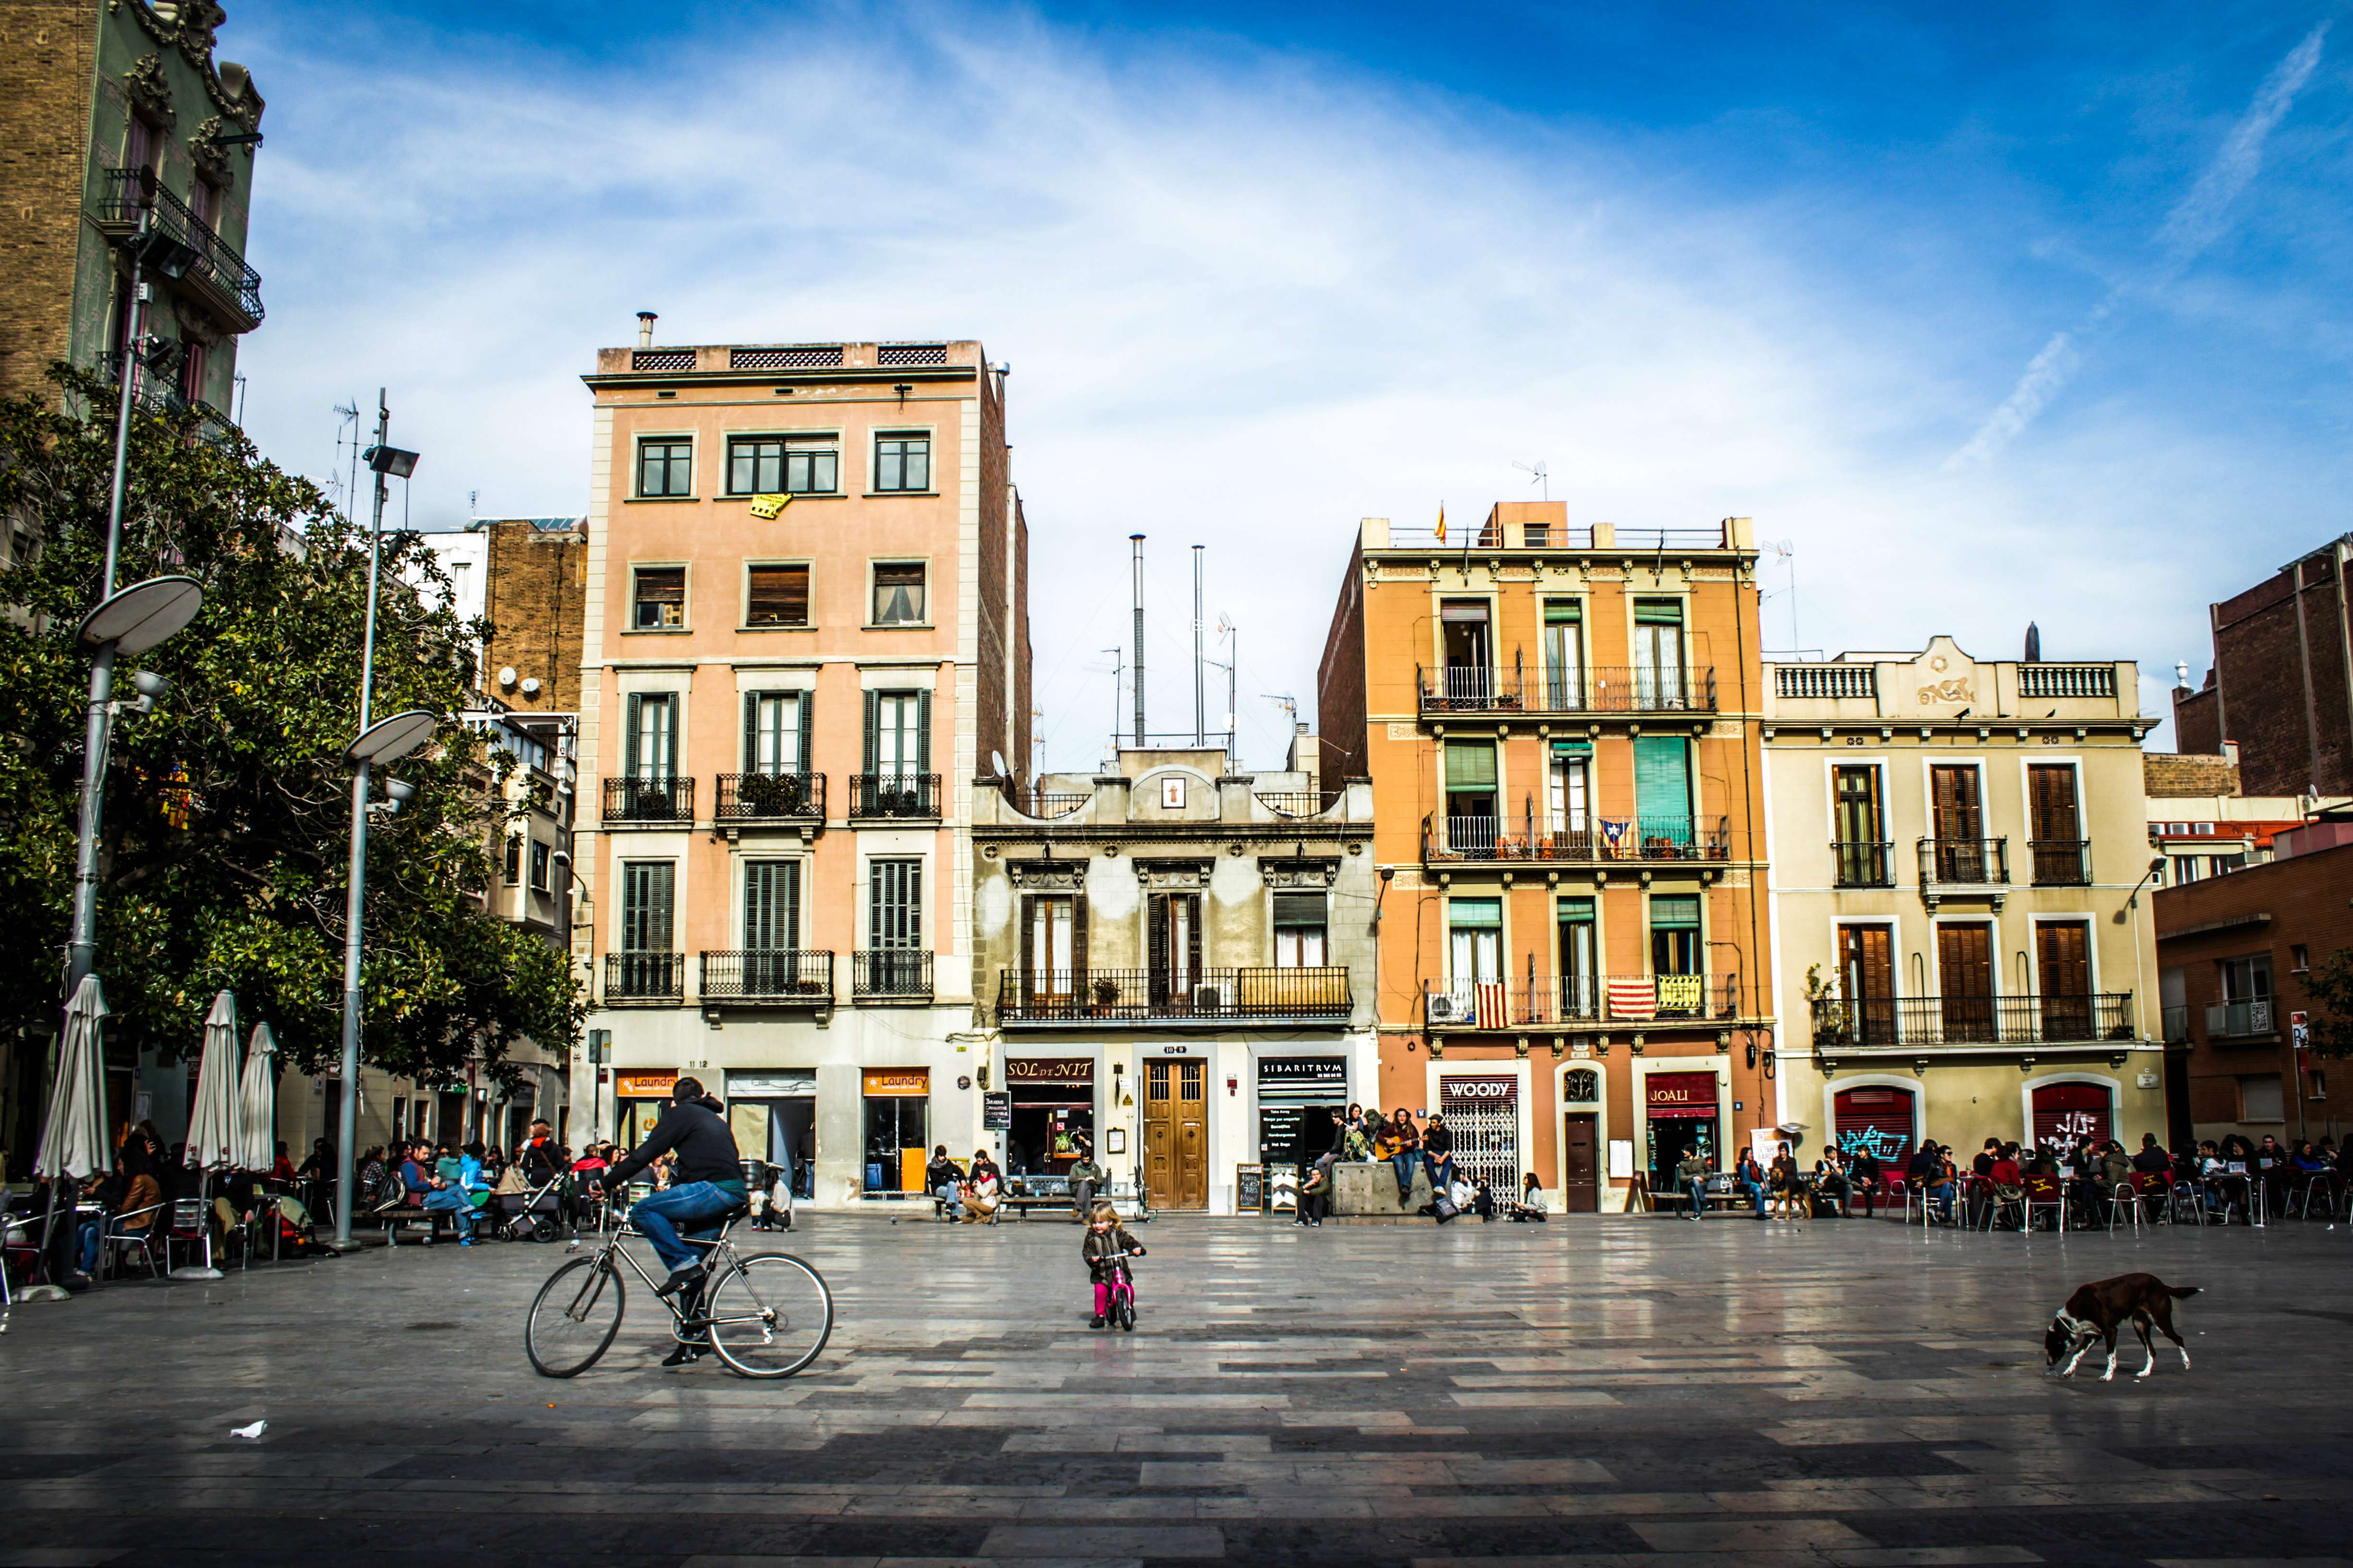 Barcelona no termina con la sagrada familia o el park for Plaza del sol